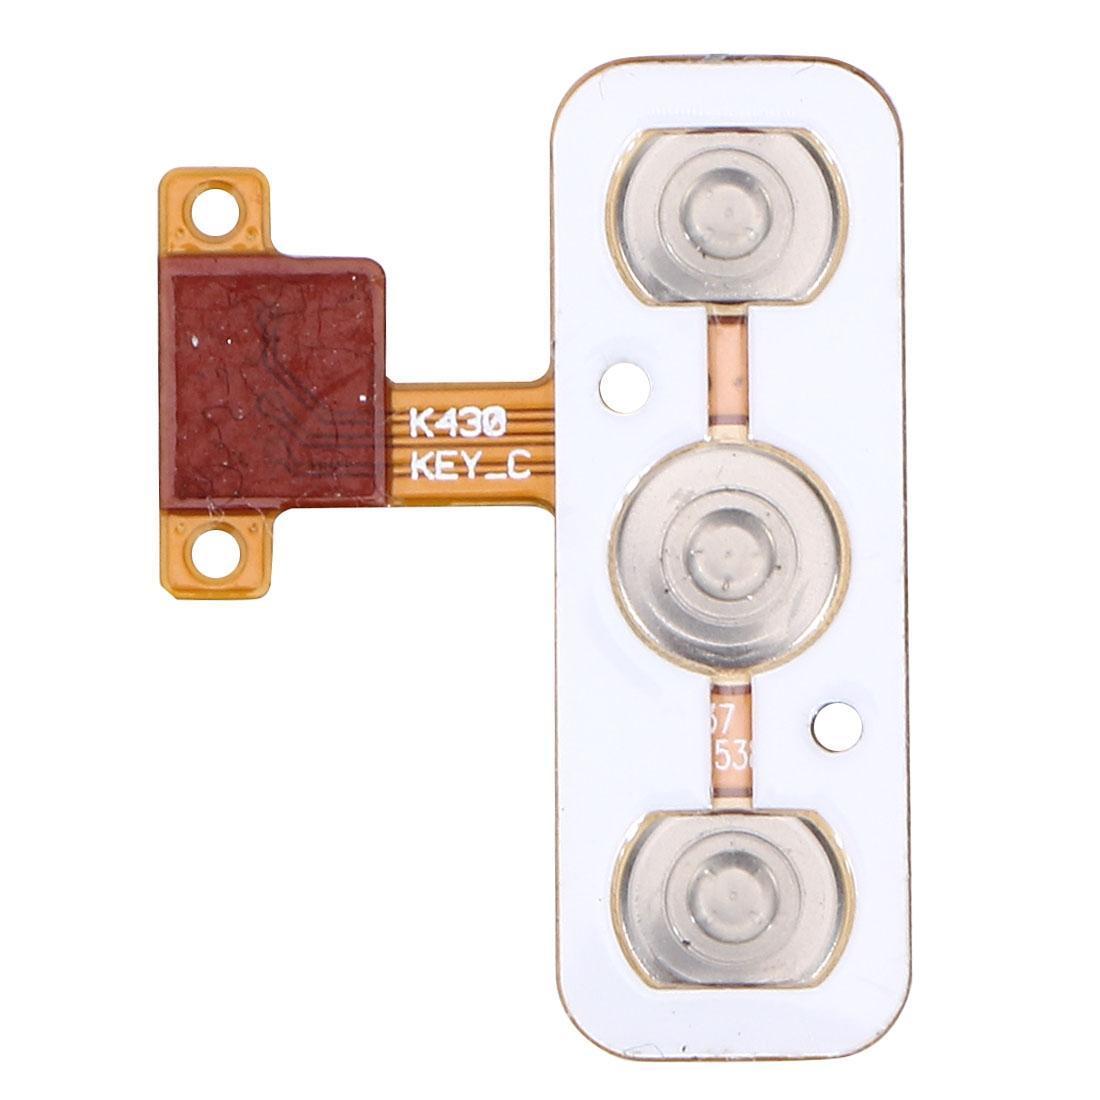 Power-Knopf-Flexkabel für LG K10 / K430